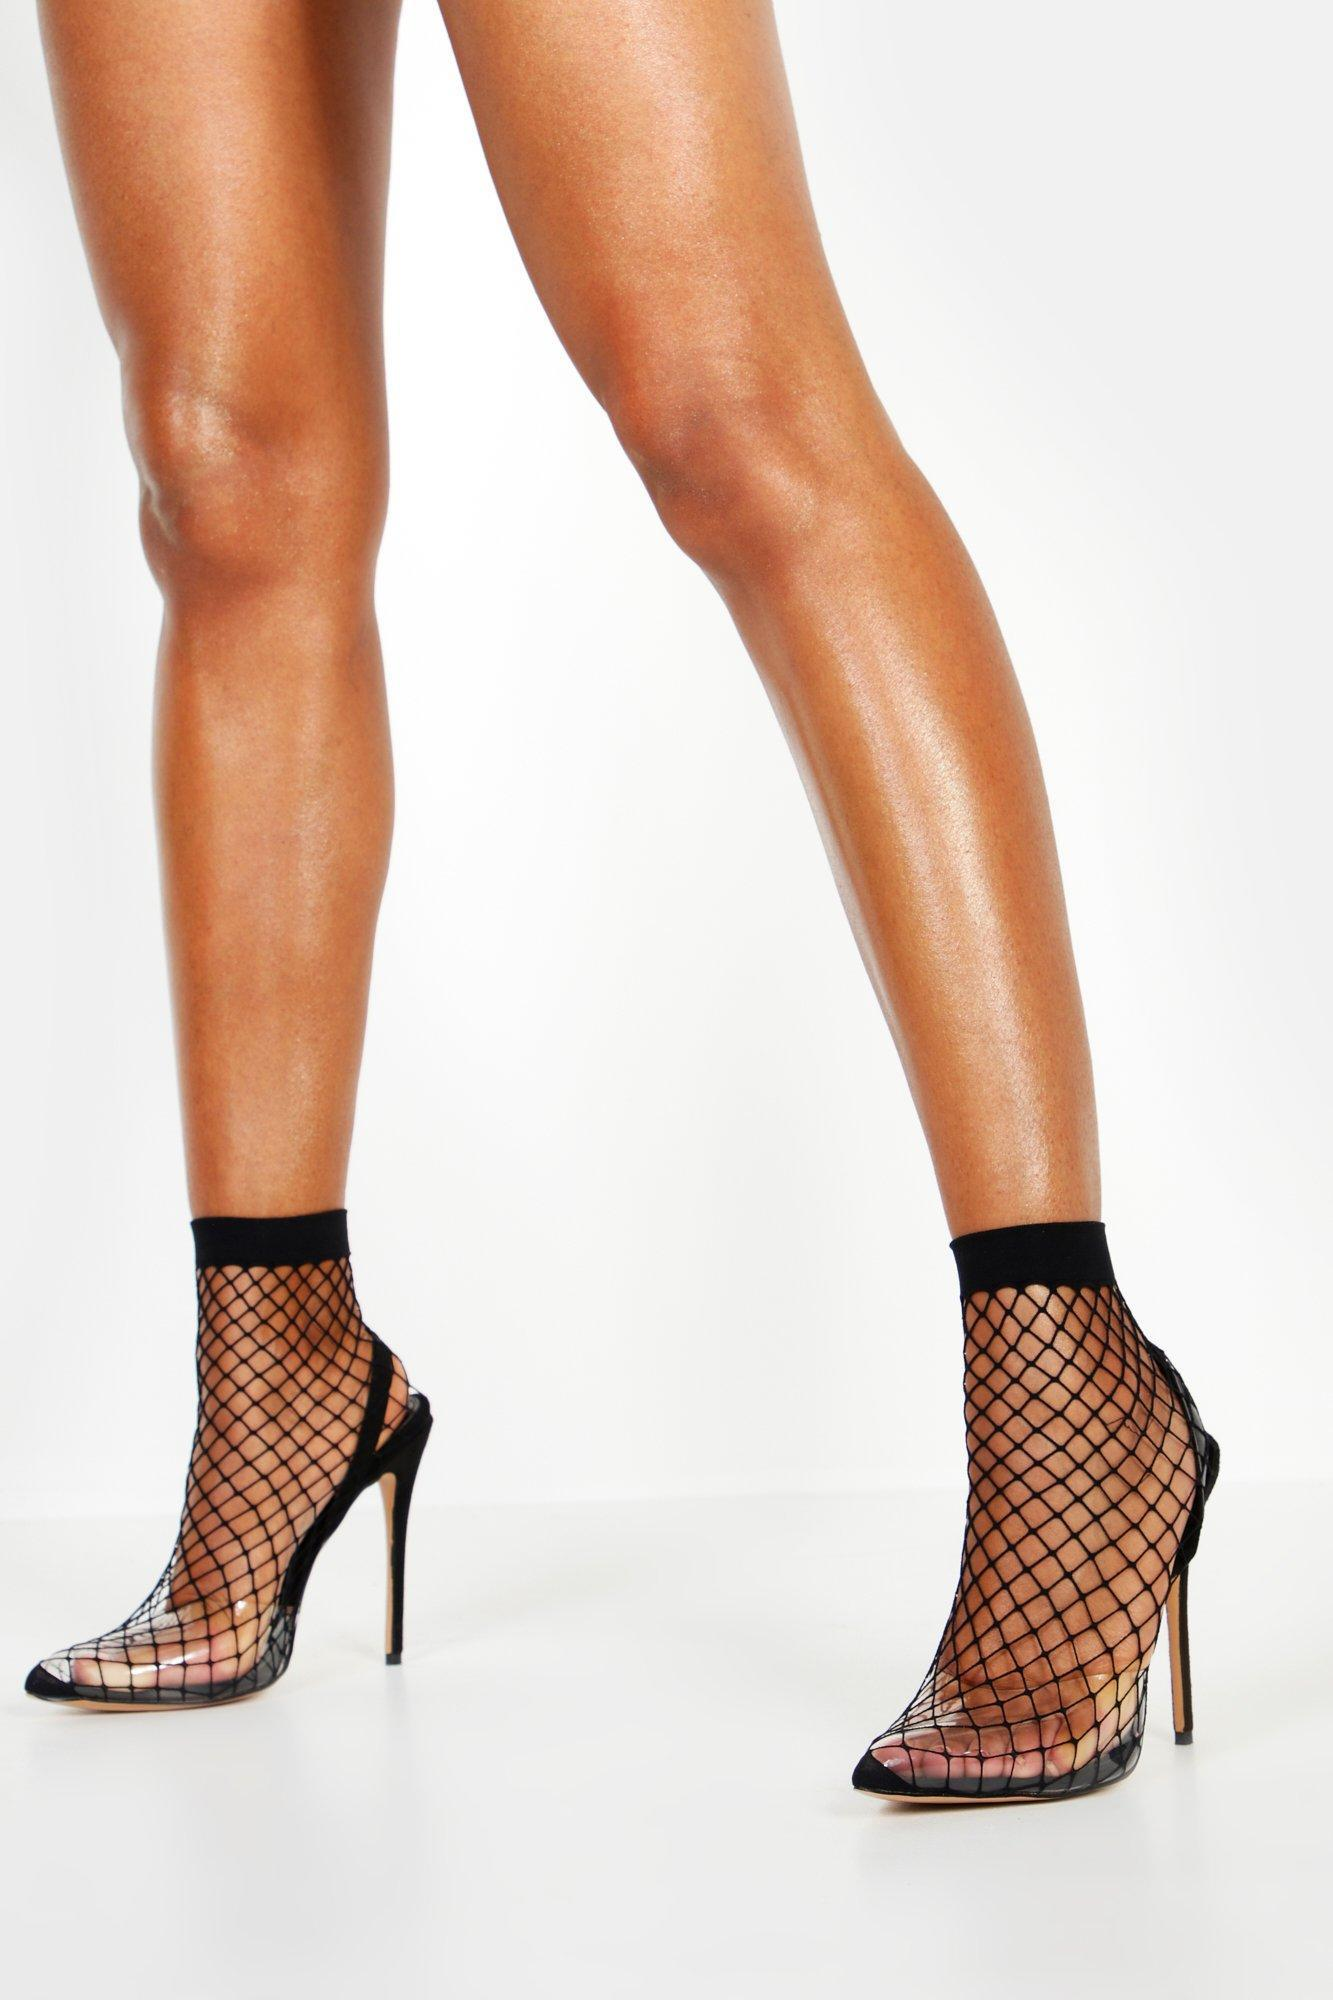 c0386c4bfa Boohoo - Black Fishnet Slingback Pointed Toe Heels - Lyst. View fullscreen